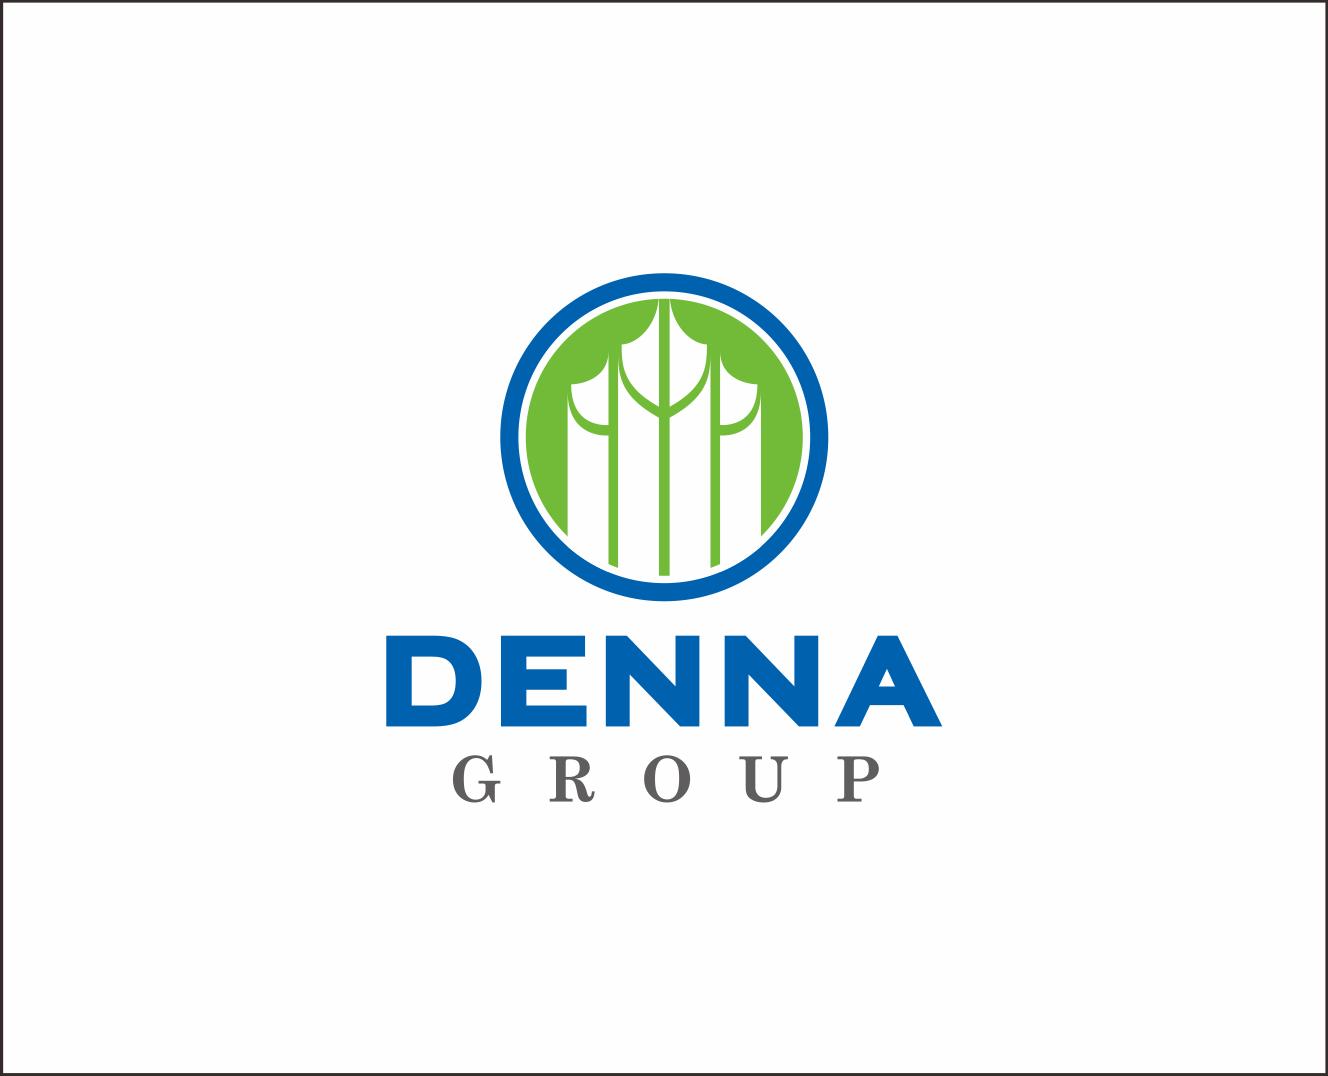 Logo Design by Armada Jamaluddin - Entry No. 130 in the Logo Design Contest Denna Group Logo Design.